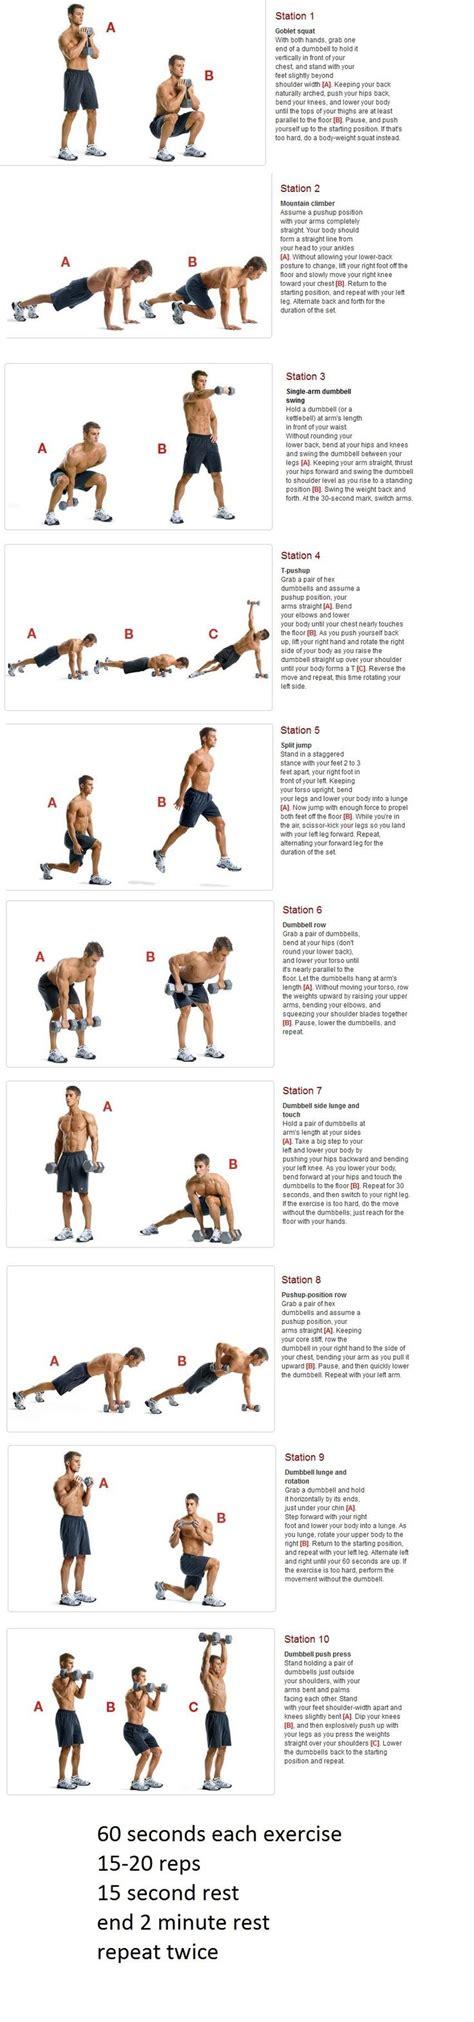 spartacus workout ideas  pinterest